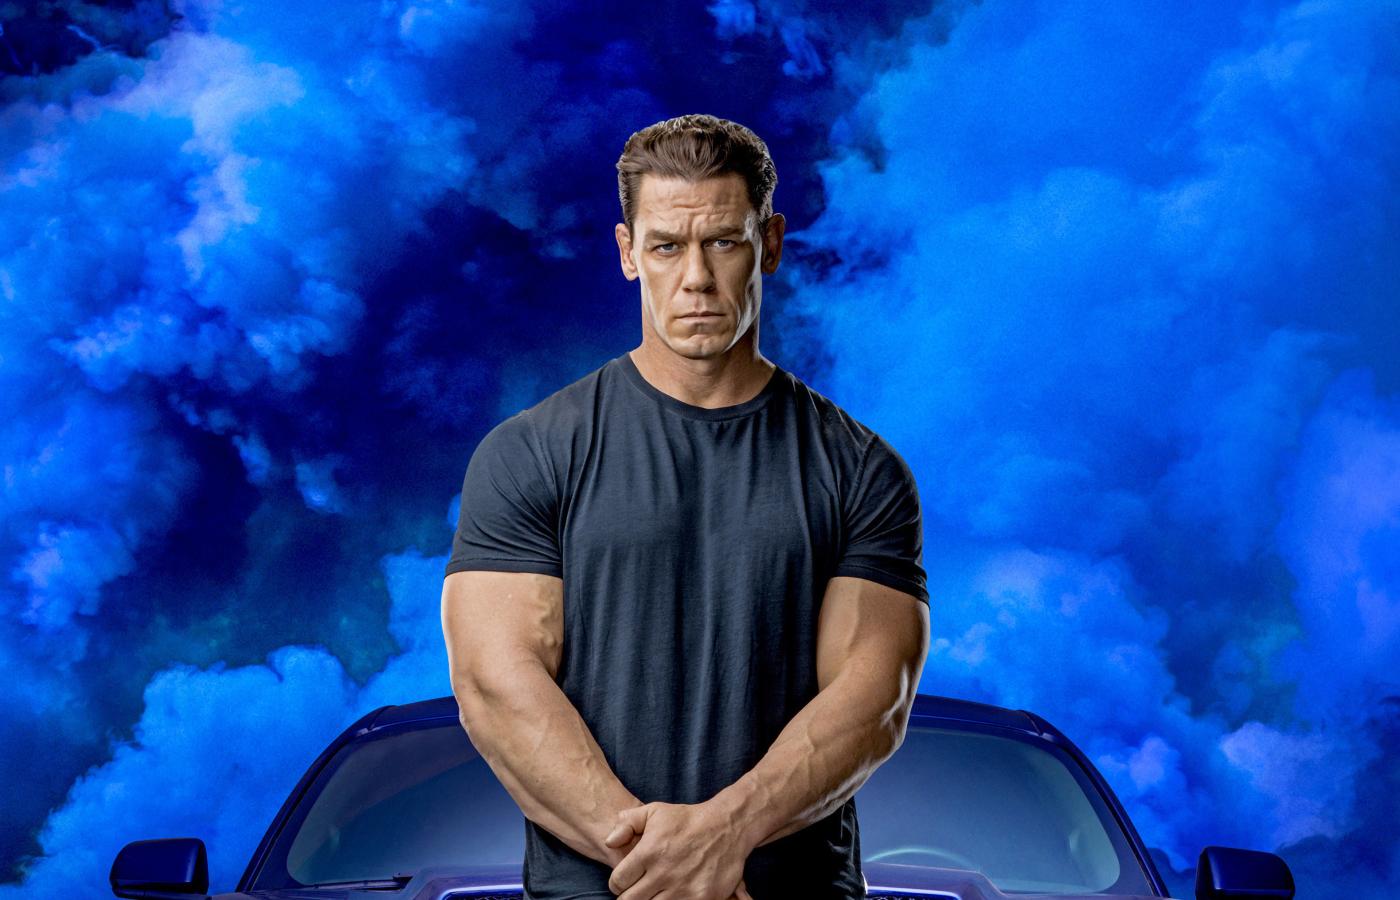 1400x900 John Cena Fast And Furious 9 1400x900 Resolution ...